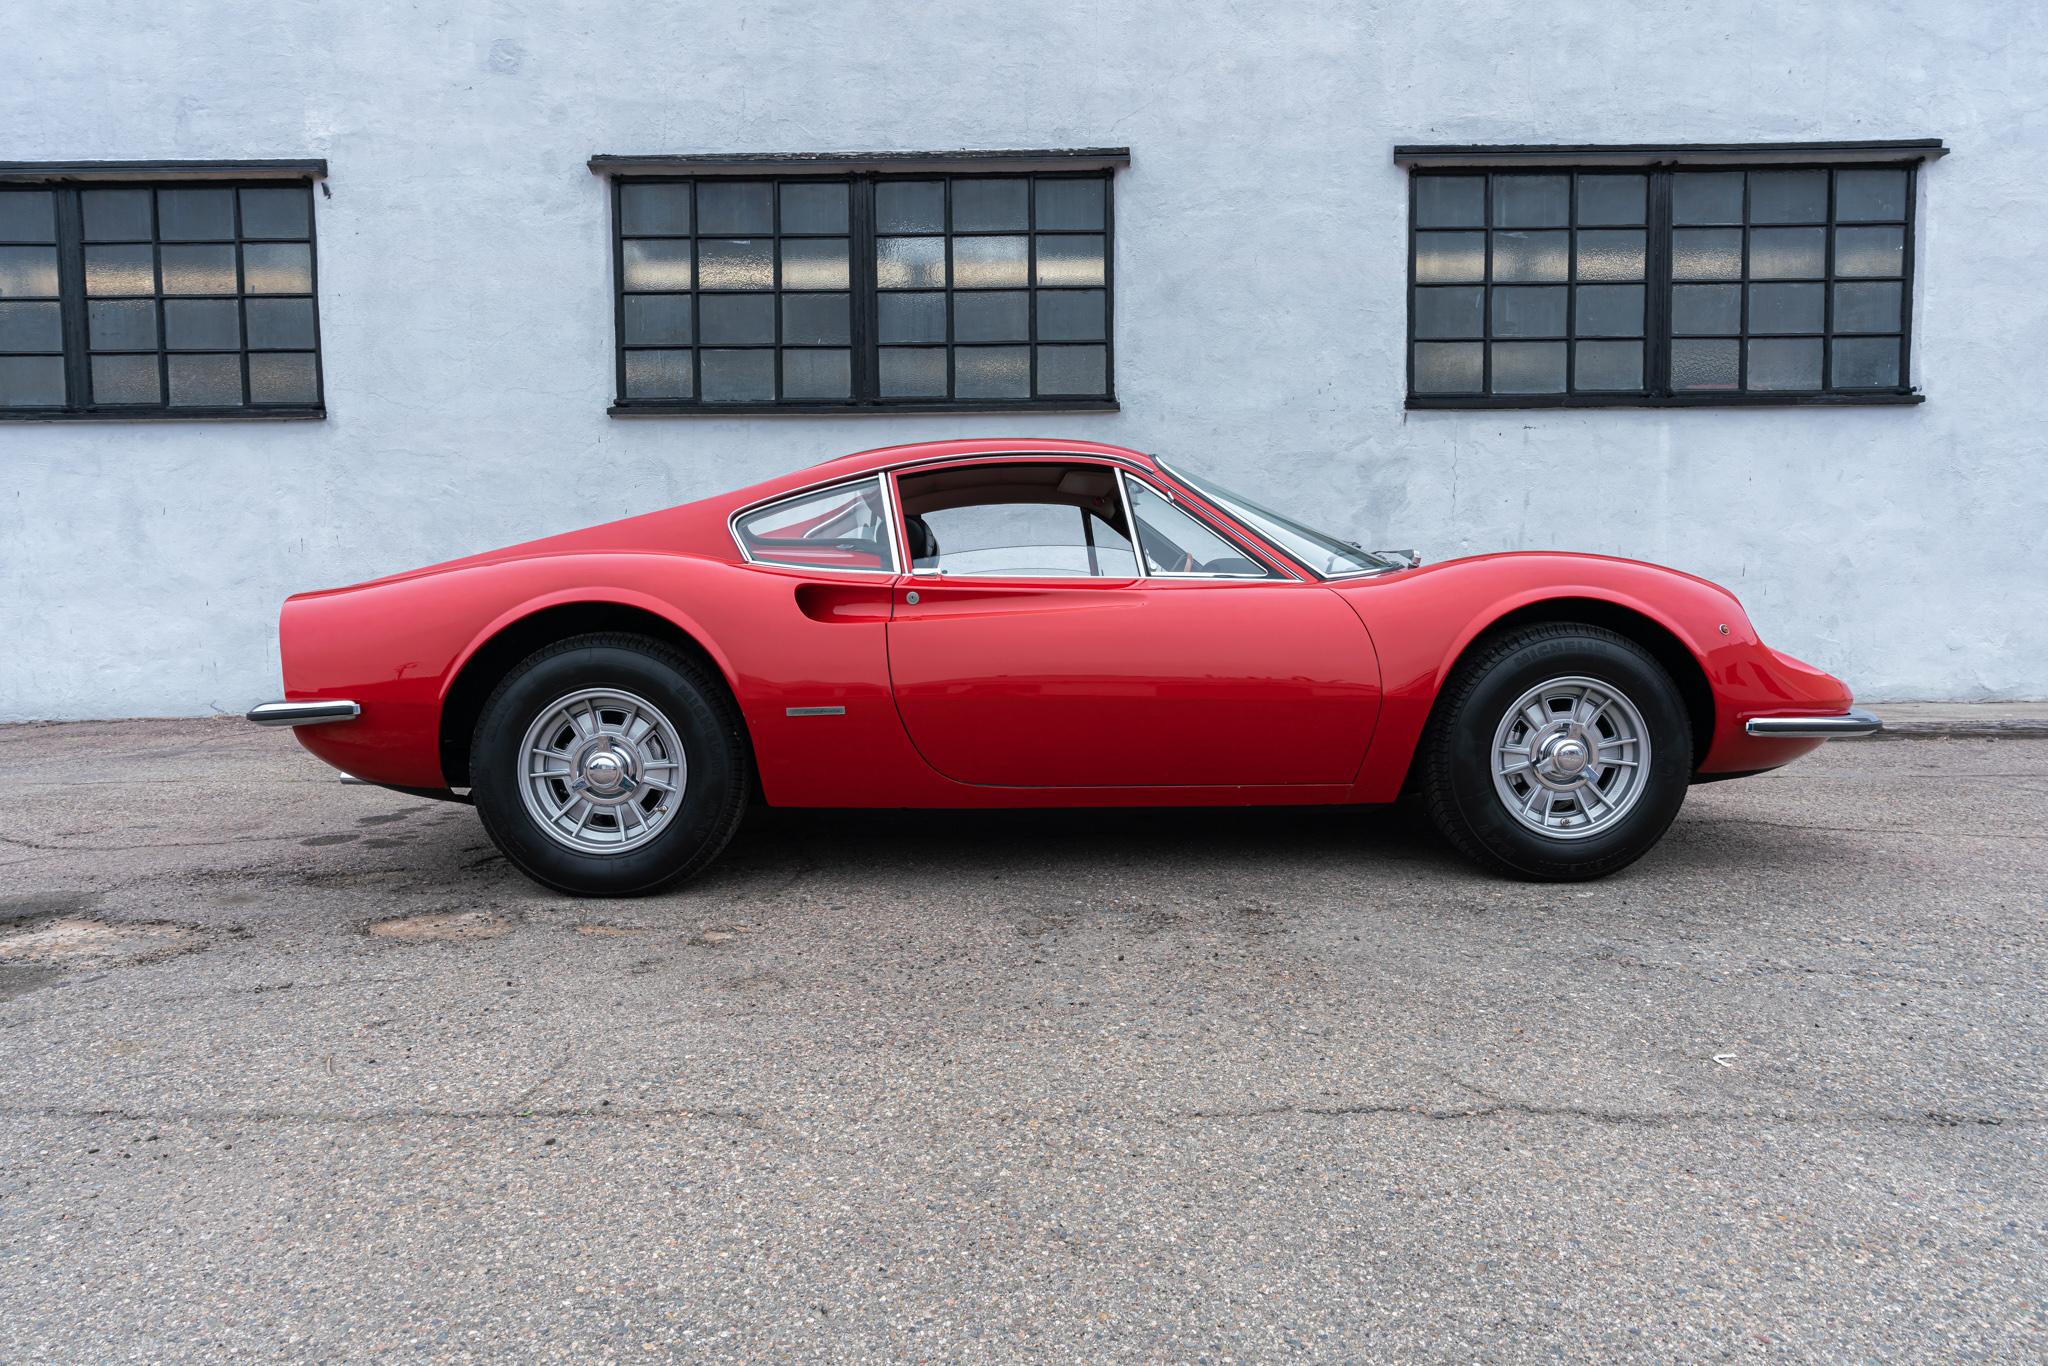 1968 Ferrari Dino 206 GT #00244 GT